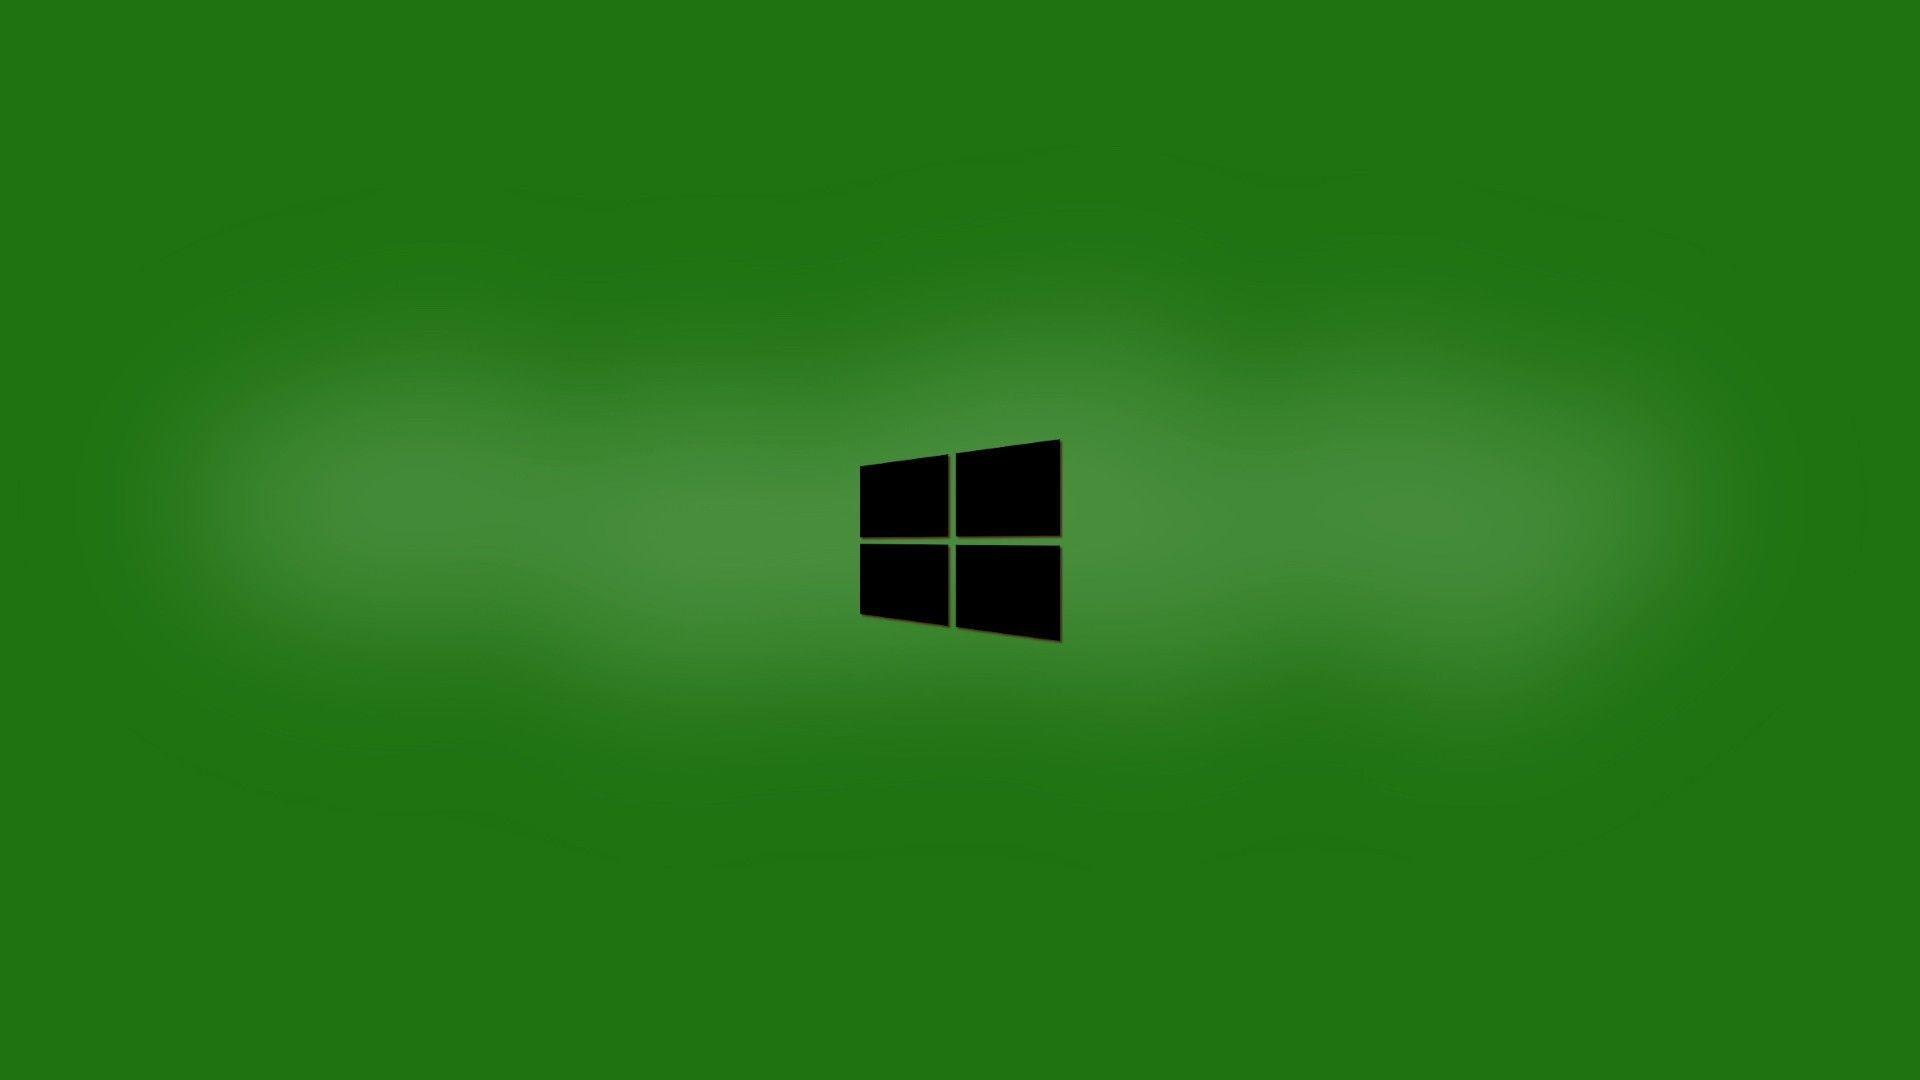 Windows Me Wallpaper